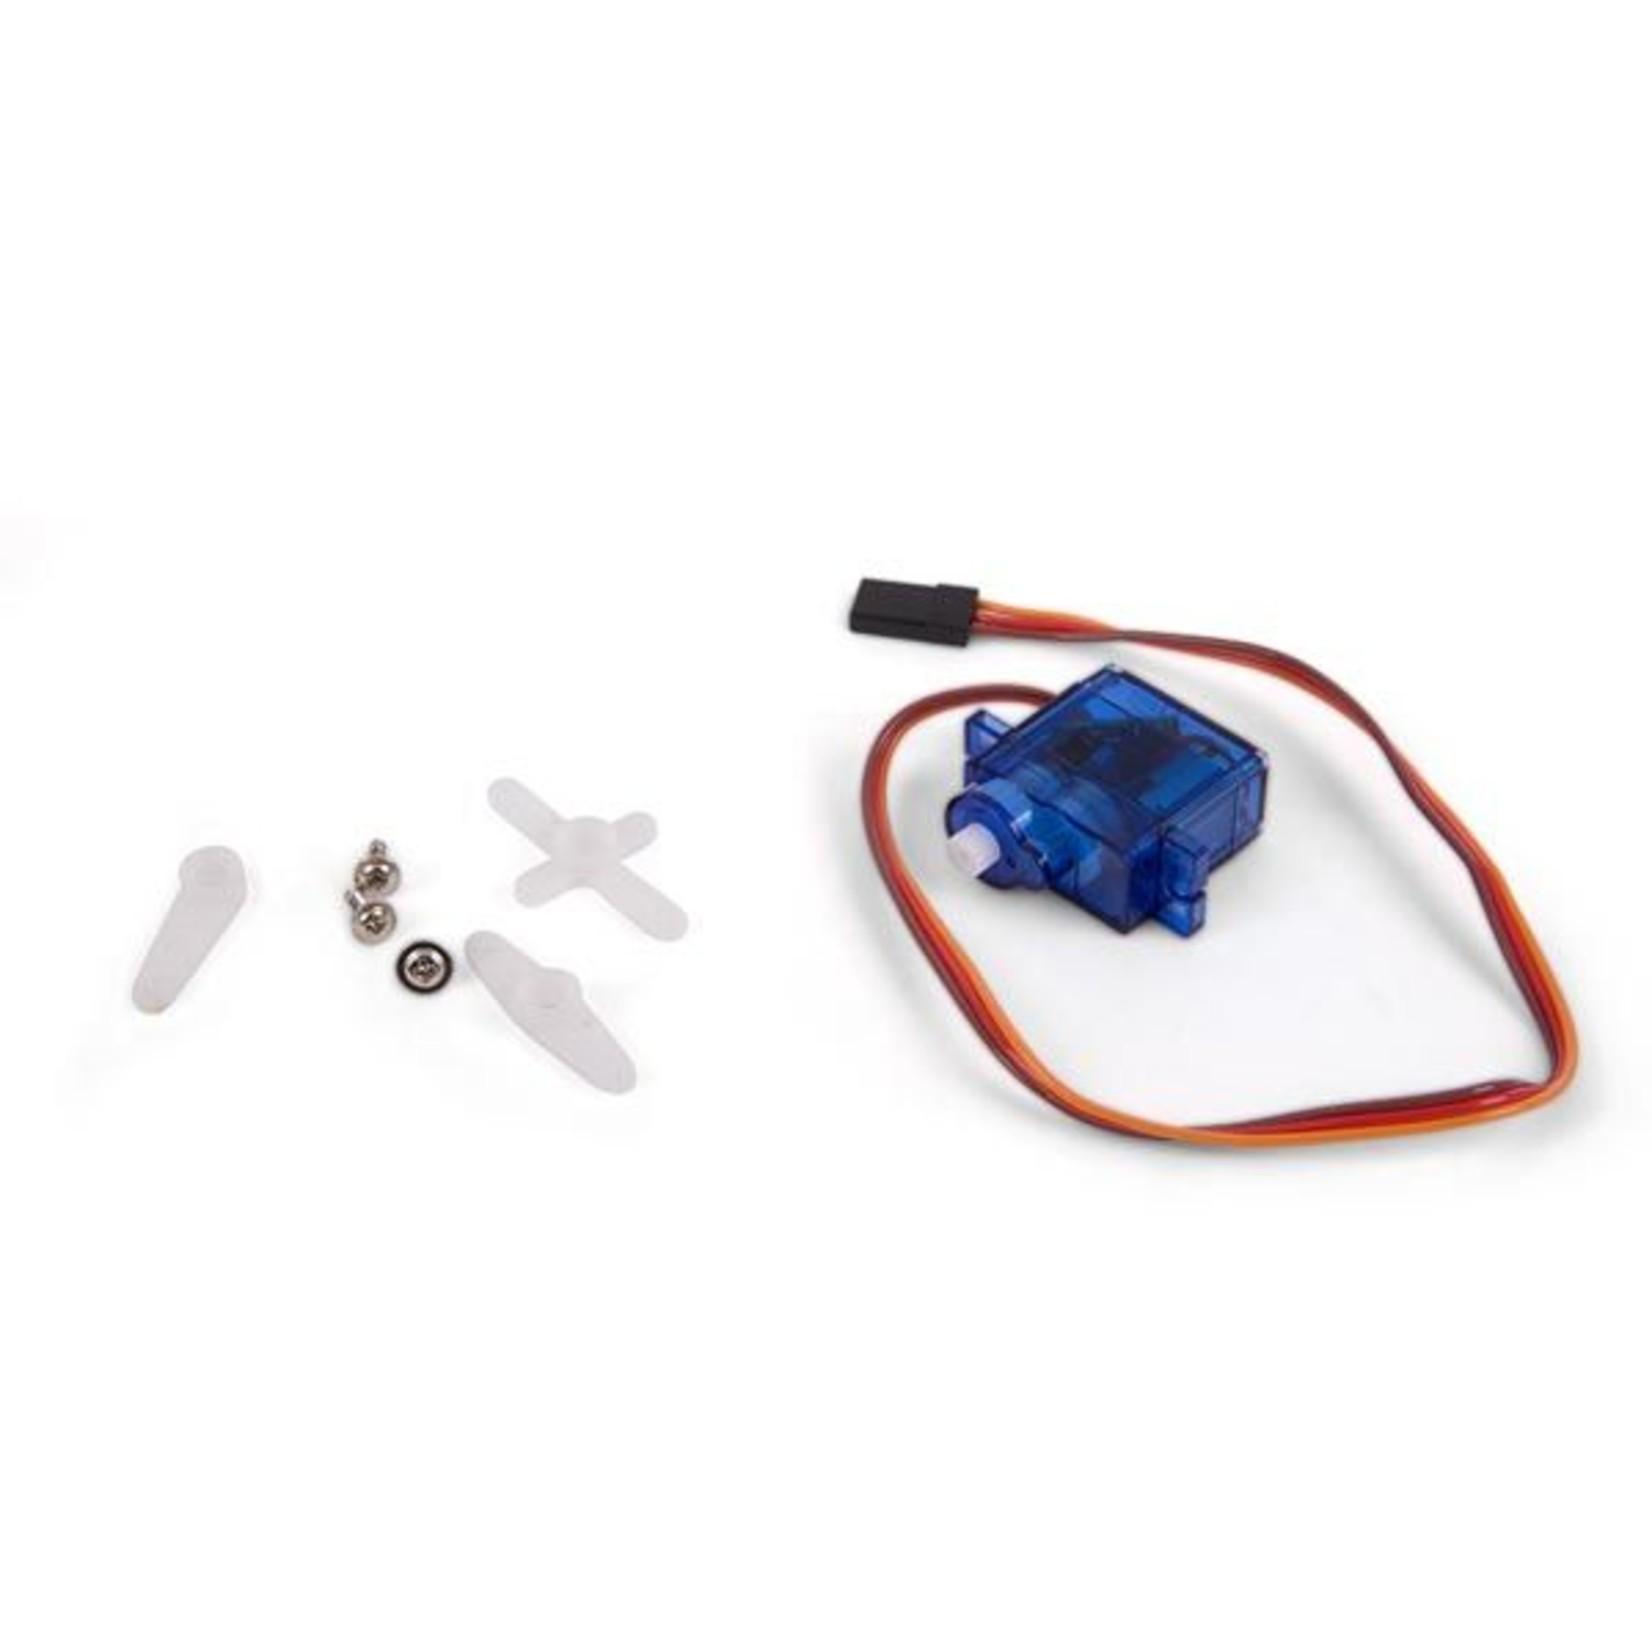 Velleman Analog mini servo - 9 g